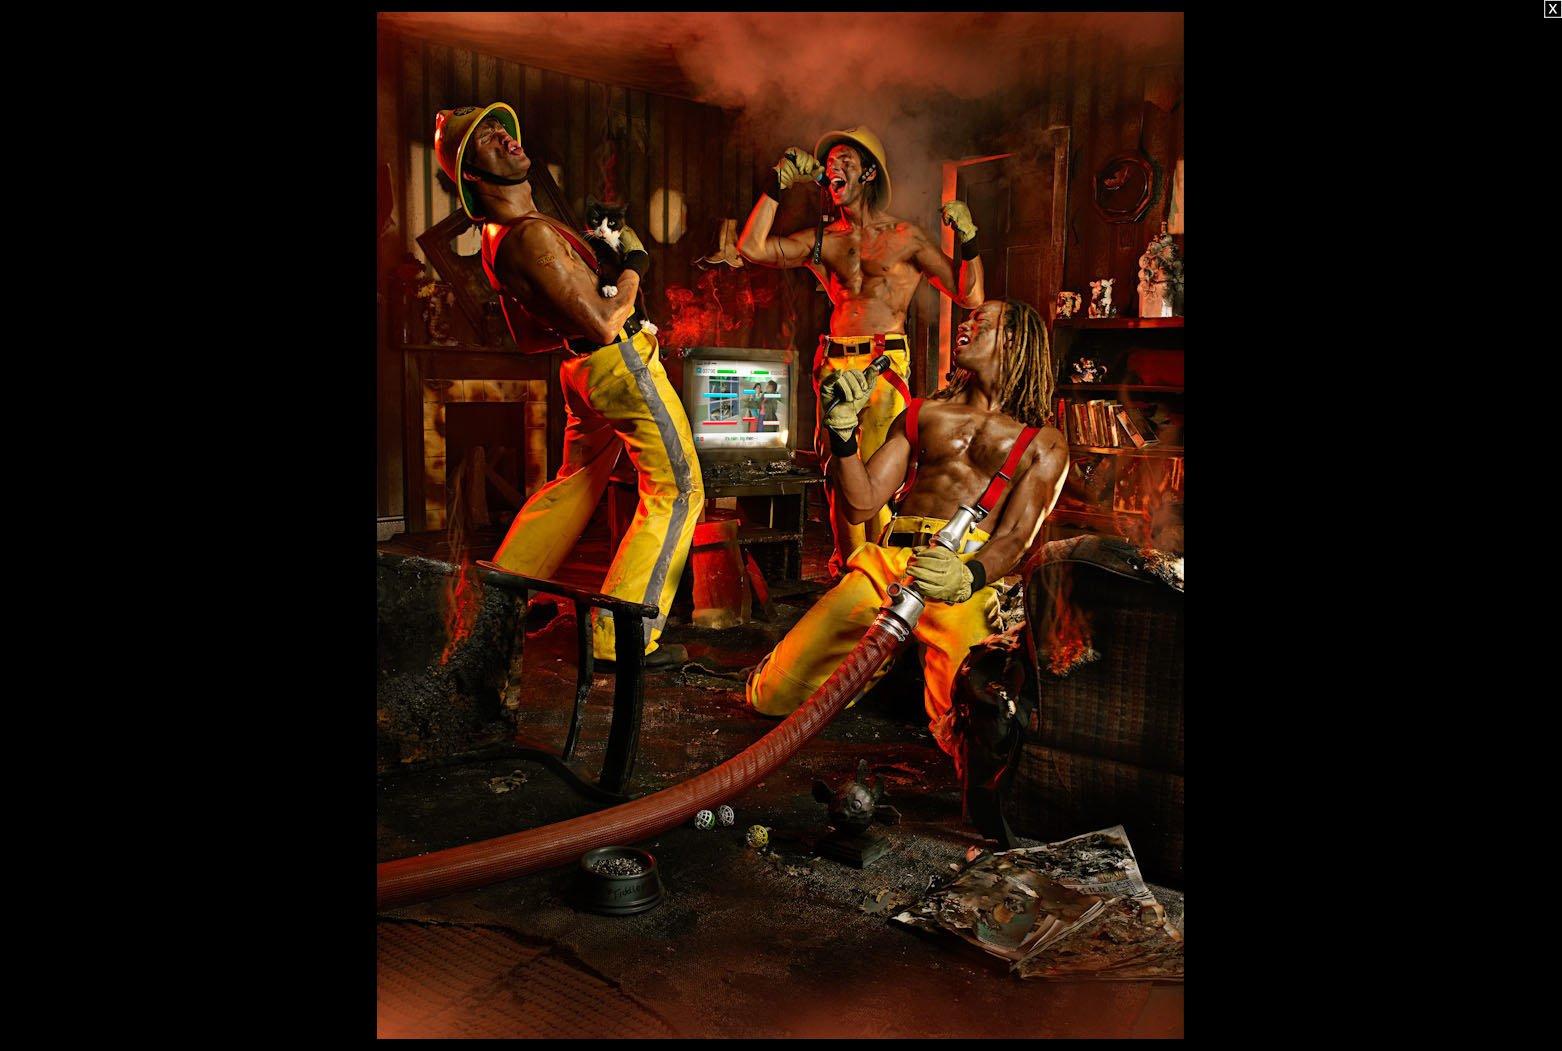 031-sony-playstation-singstar-fire